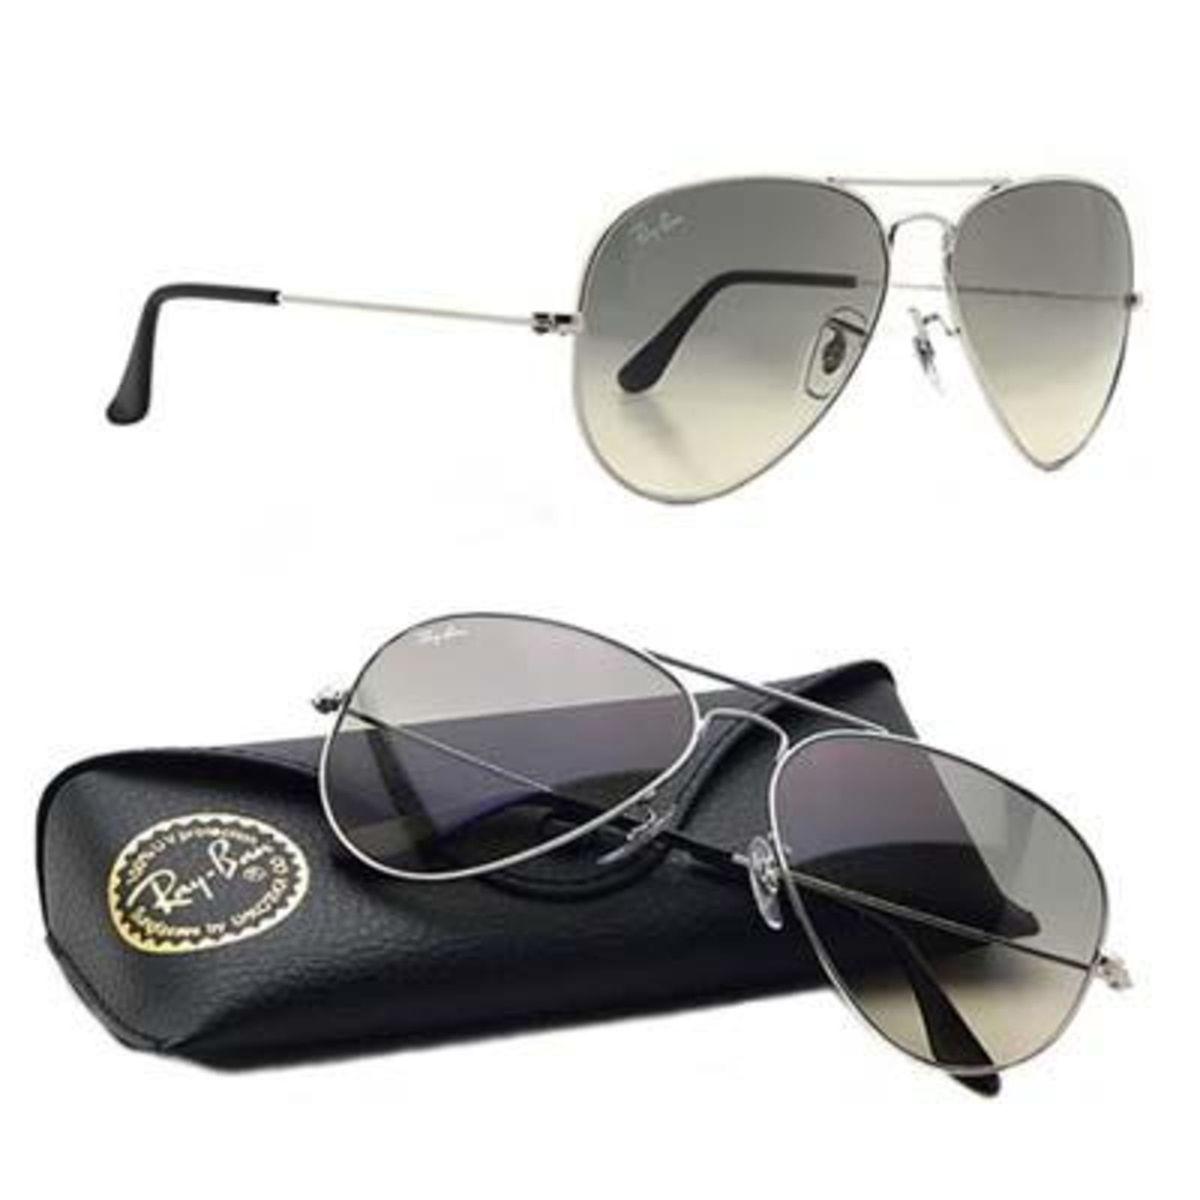 603413c3856fb Aviador Prata Fume Degrade Médio   Óculos Masculino Ray Ban Nunca ...